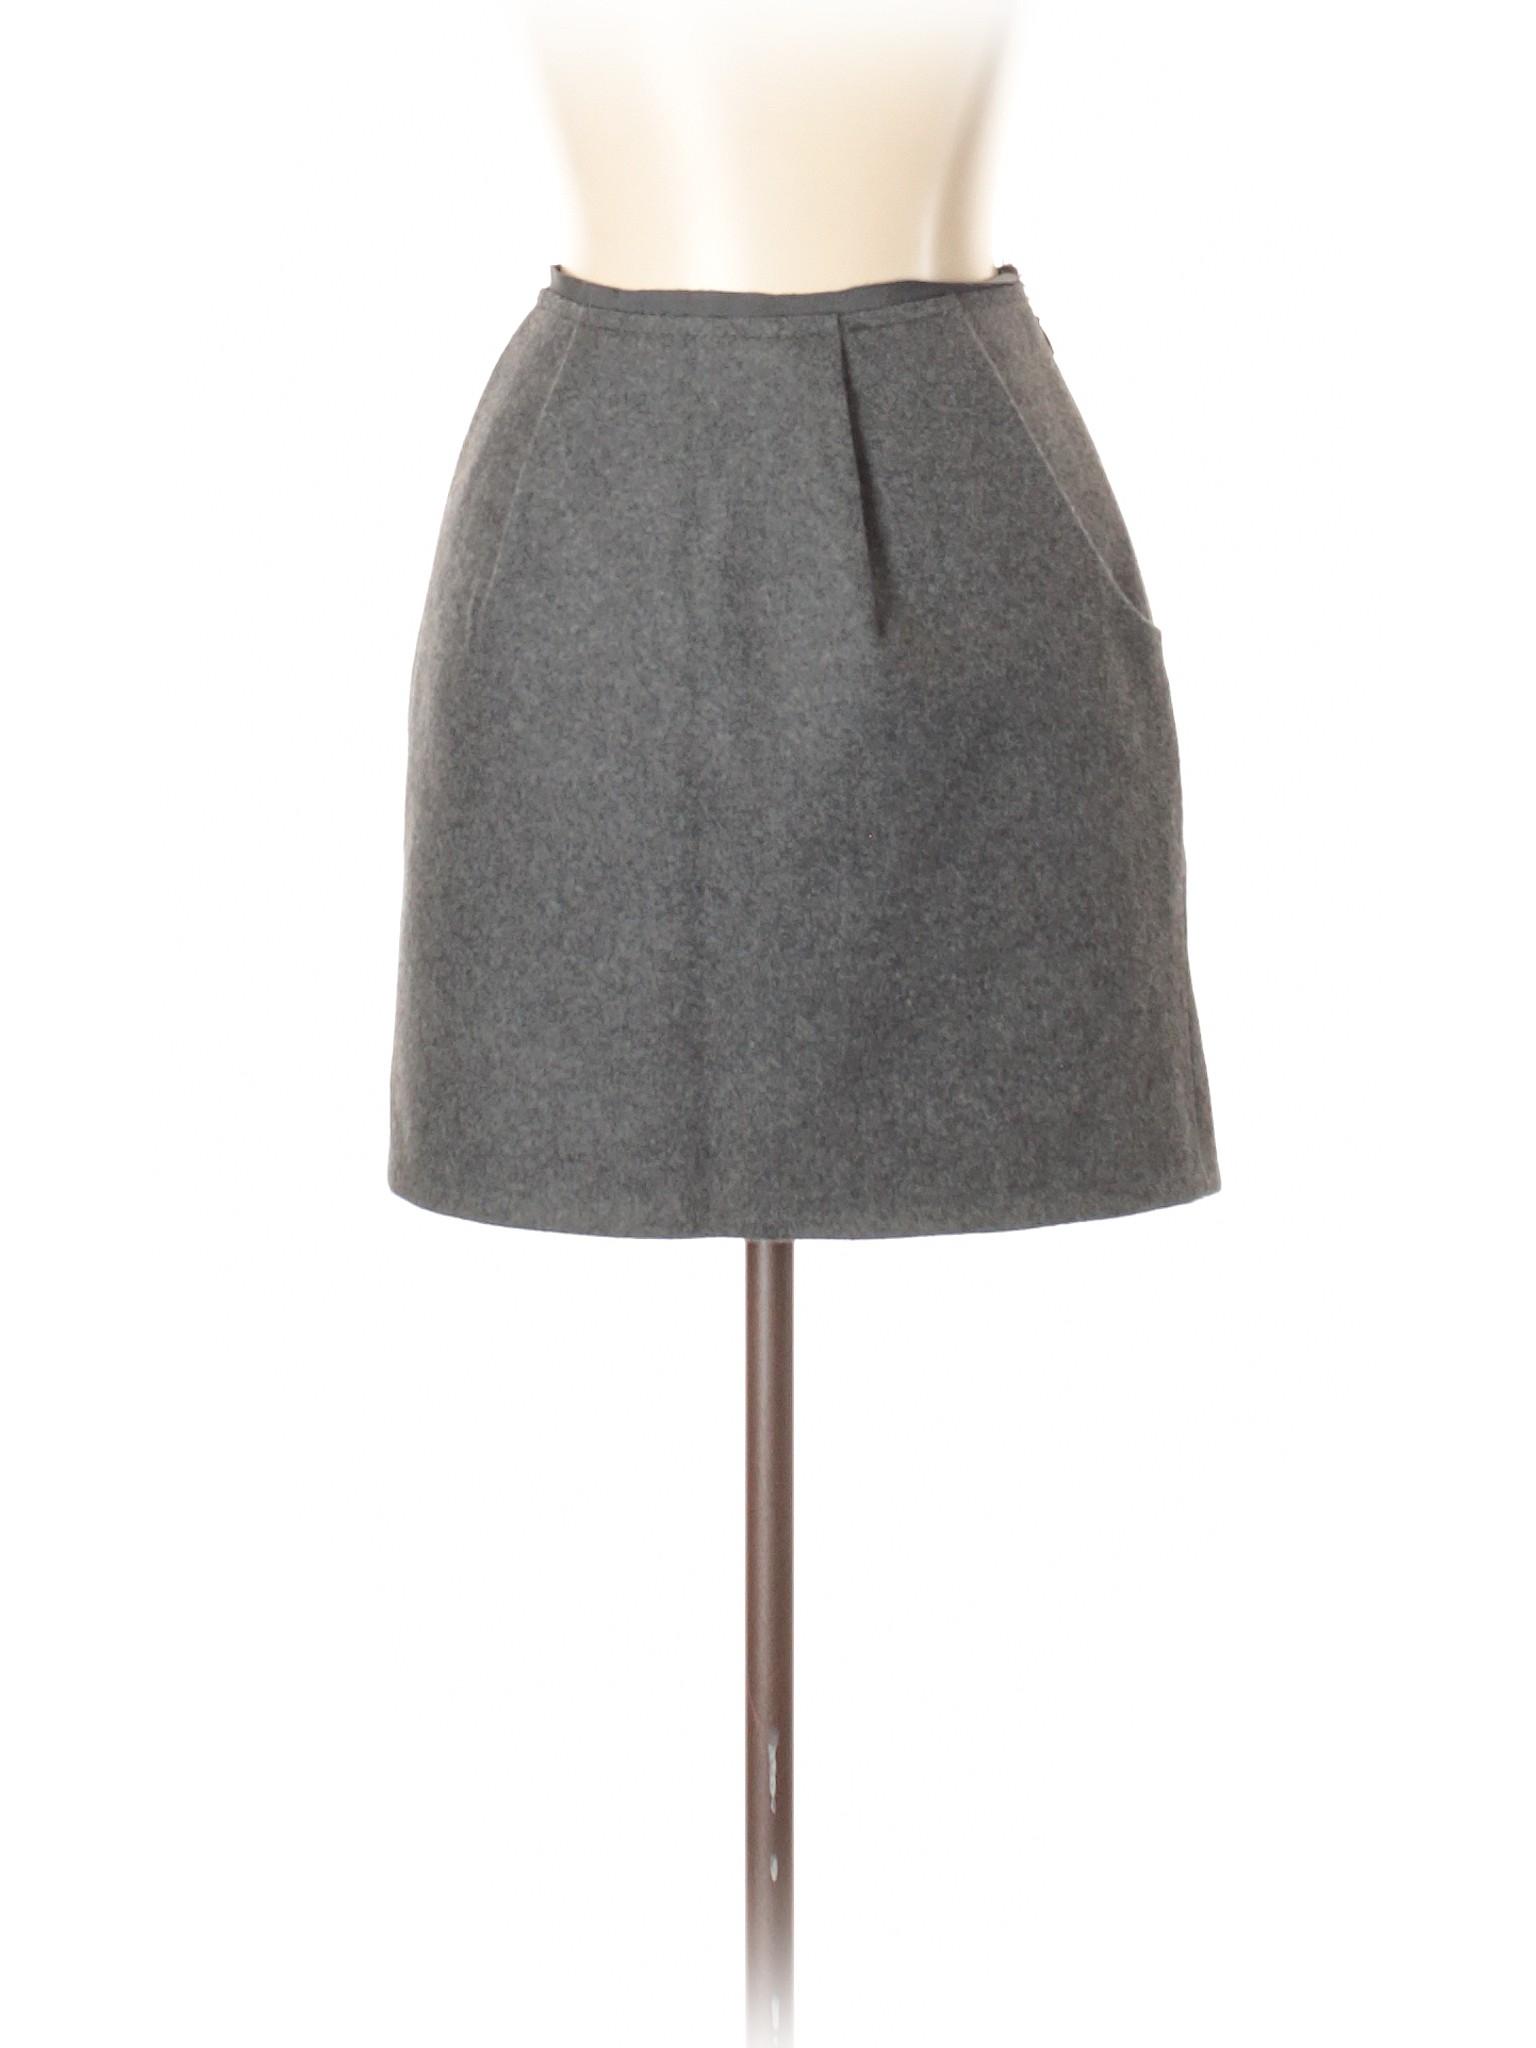 Boutique Skirt Wool Skirt Boutique Wool Boutique Wool P0dxdqC